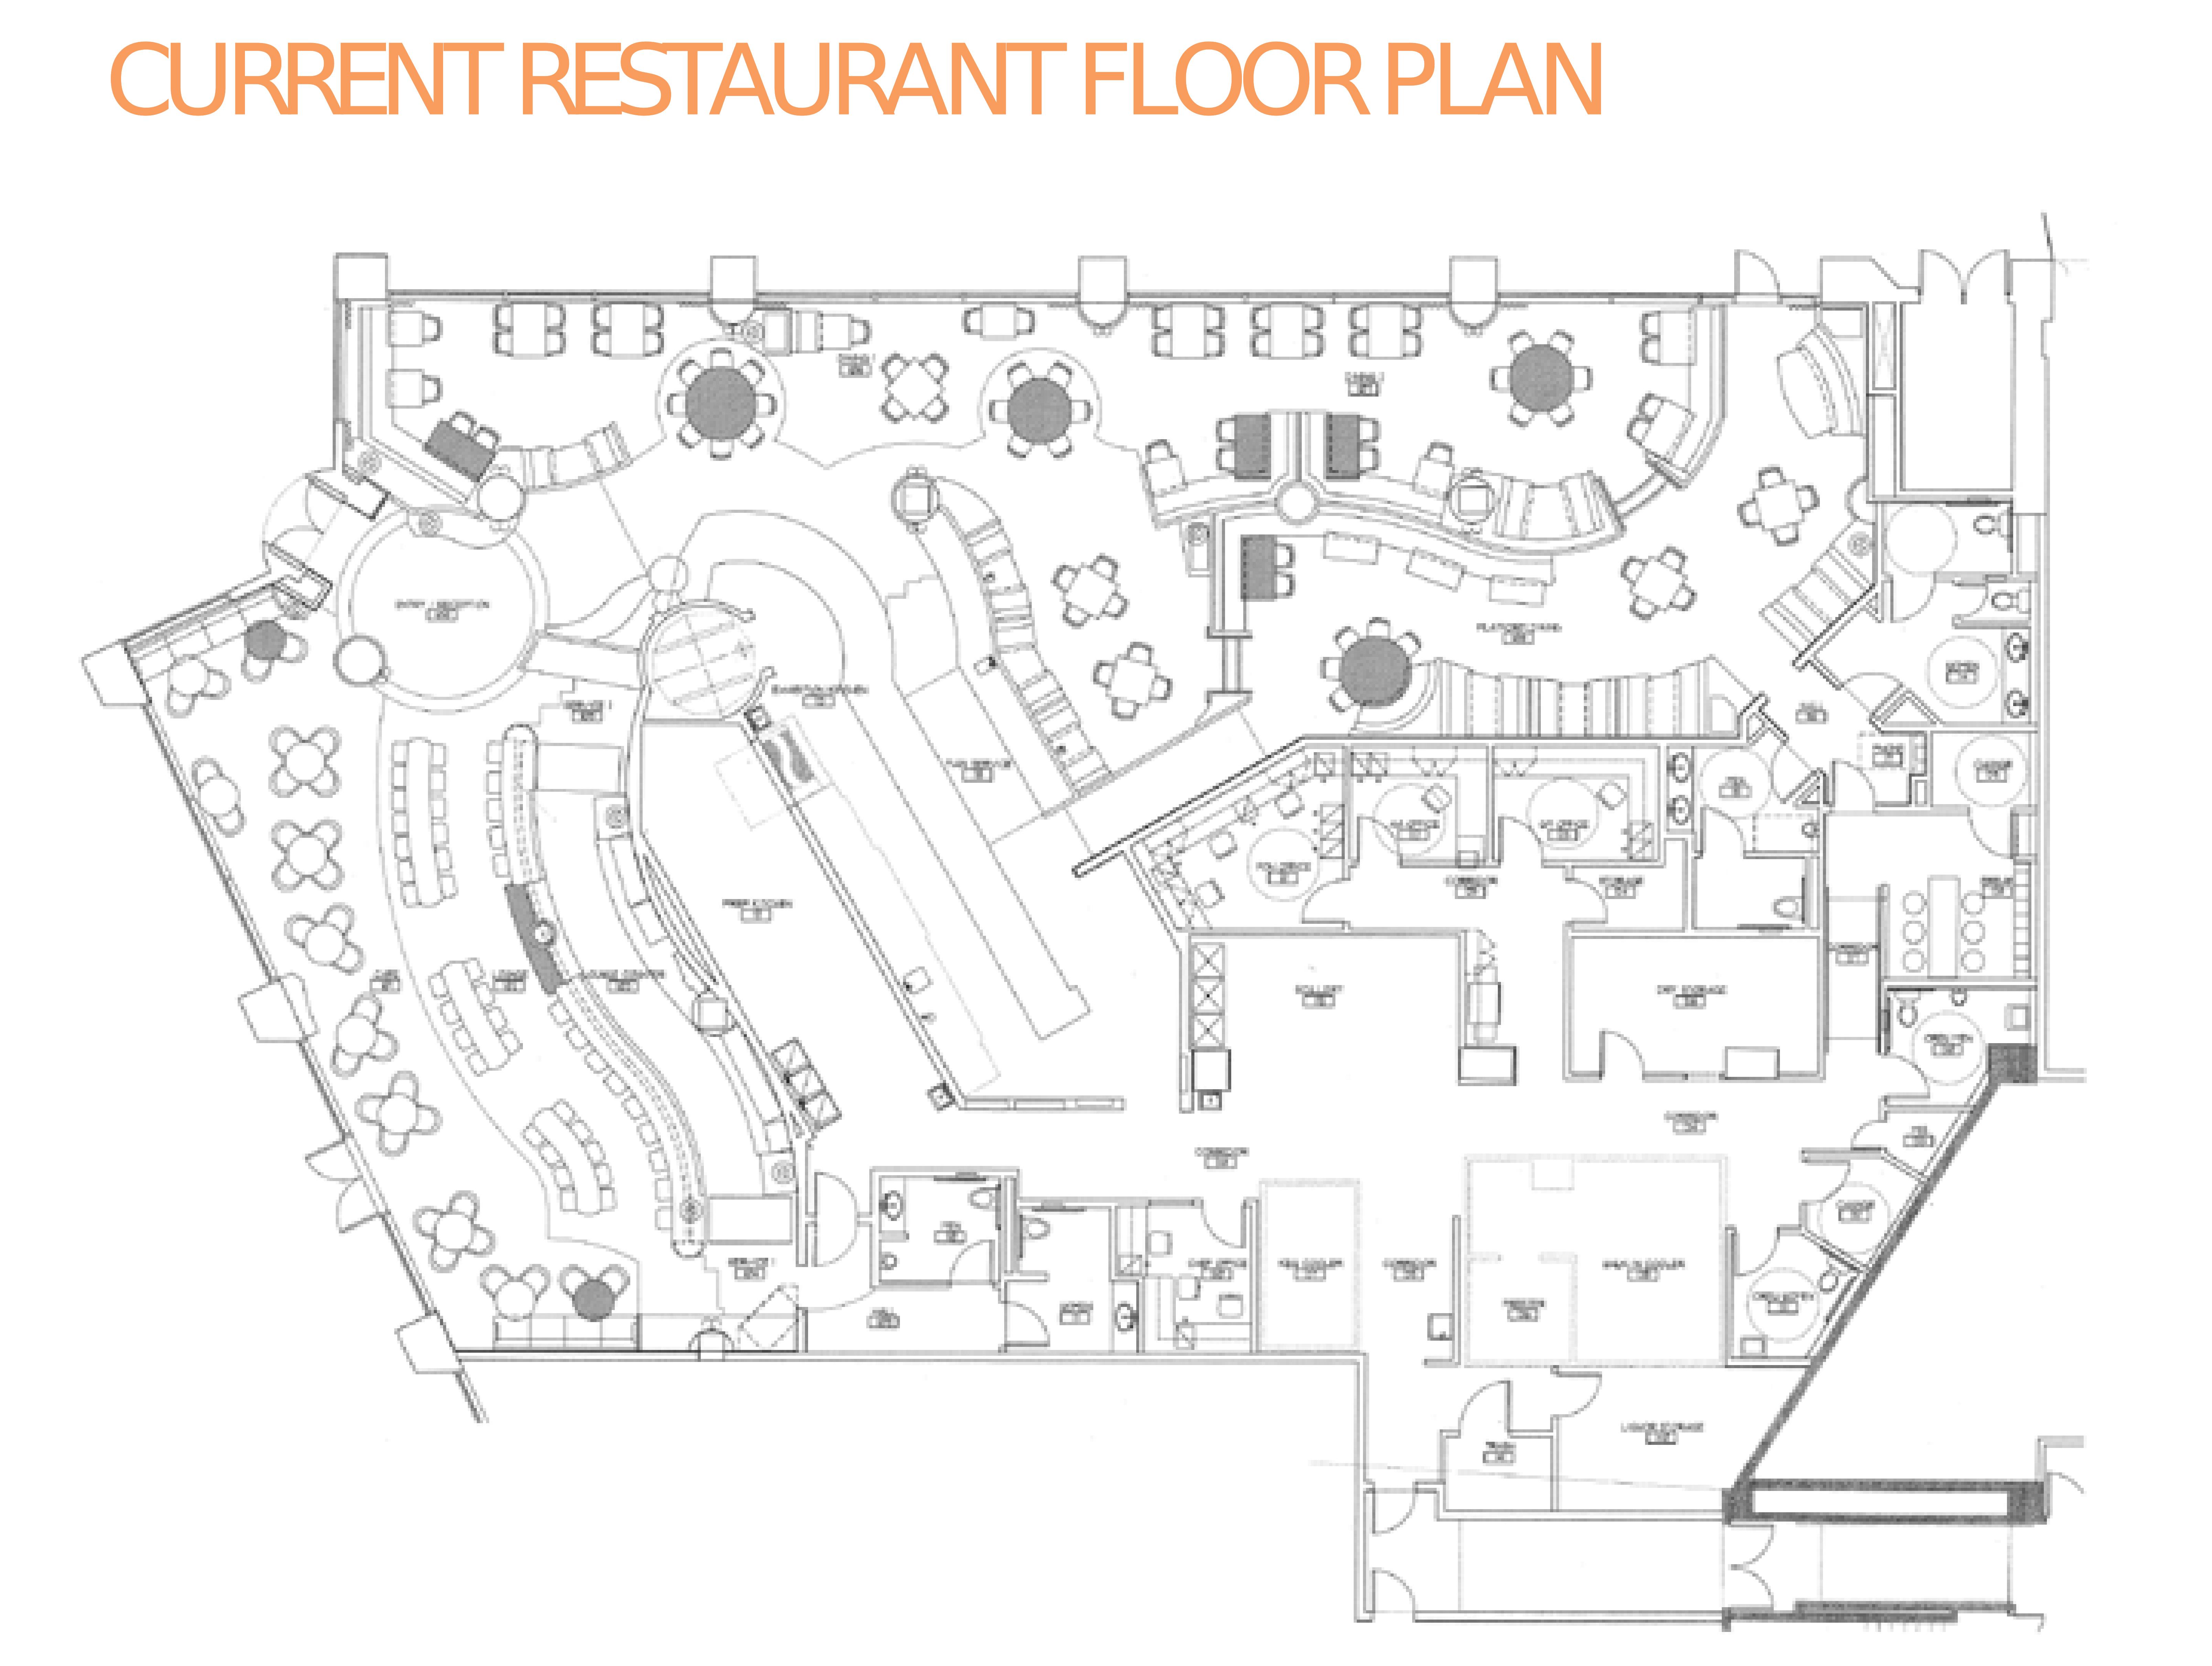 10877 Wilshire Blvd: site plan